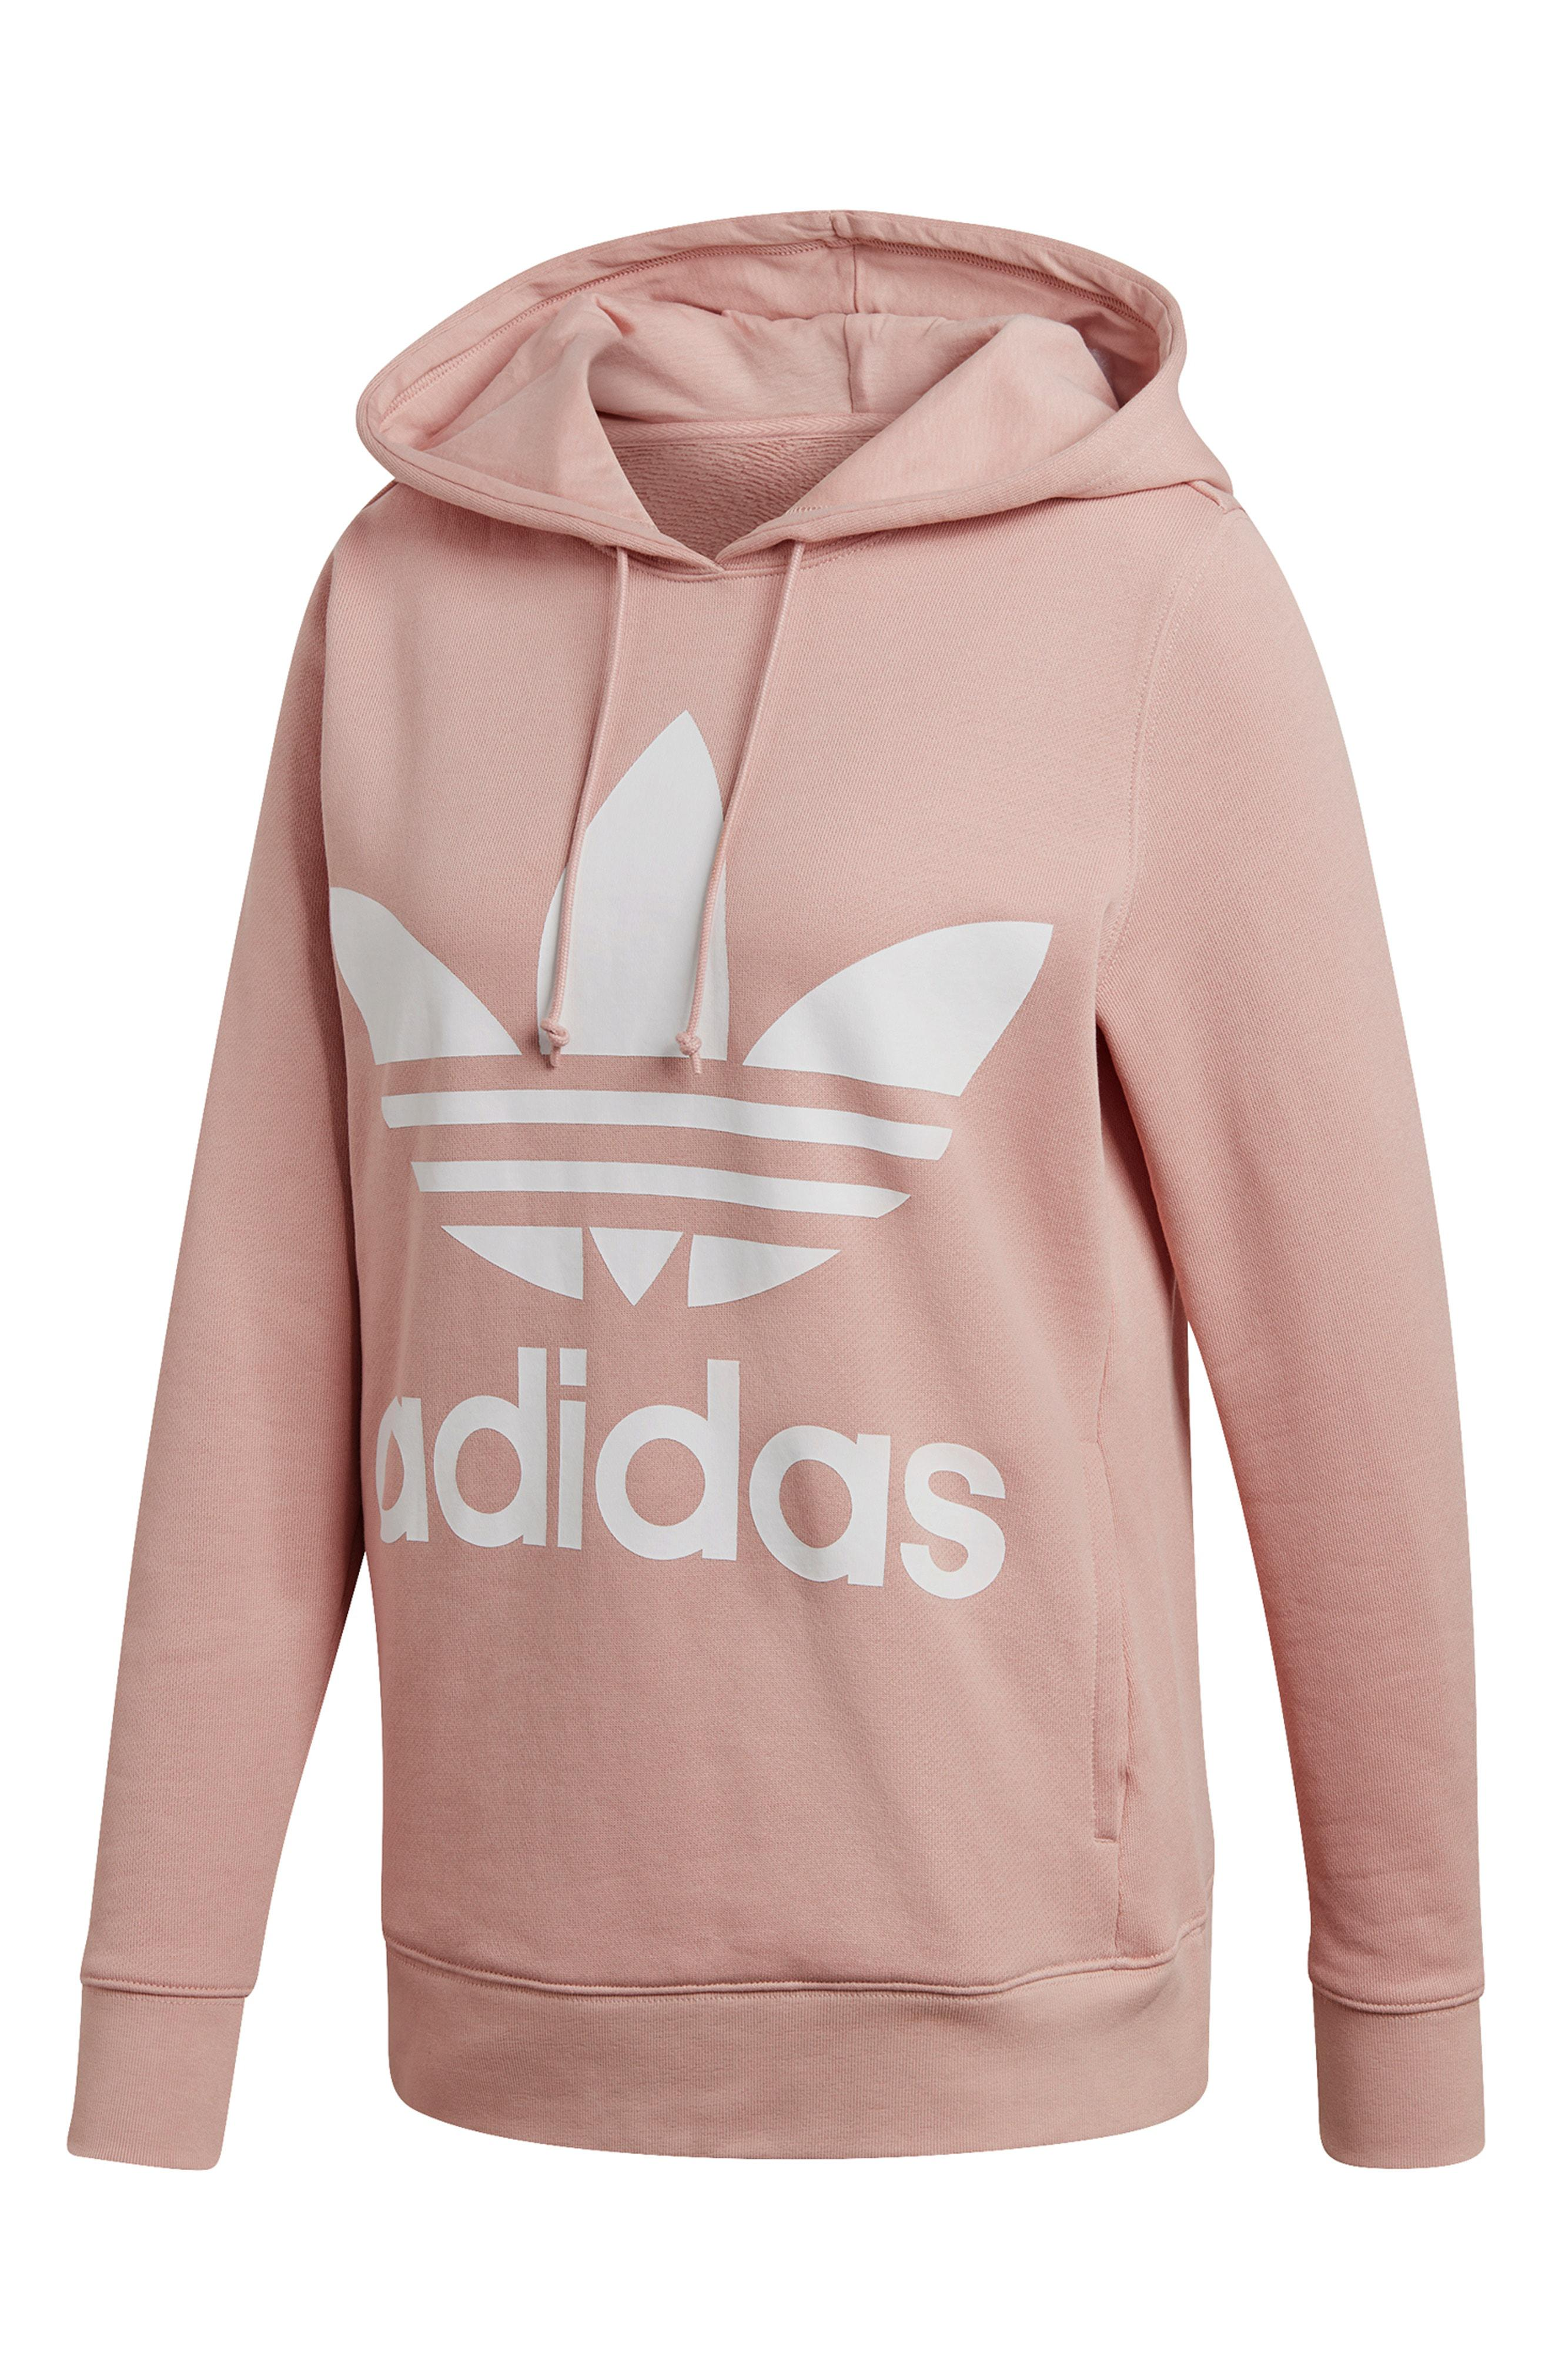 5ab1dc8727cf Lyst - Adidas Originals Trefoil Hoodie in Pink